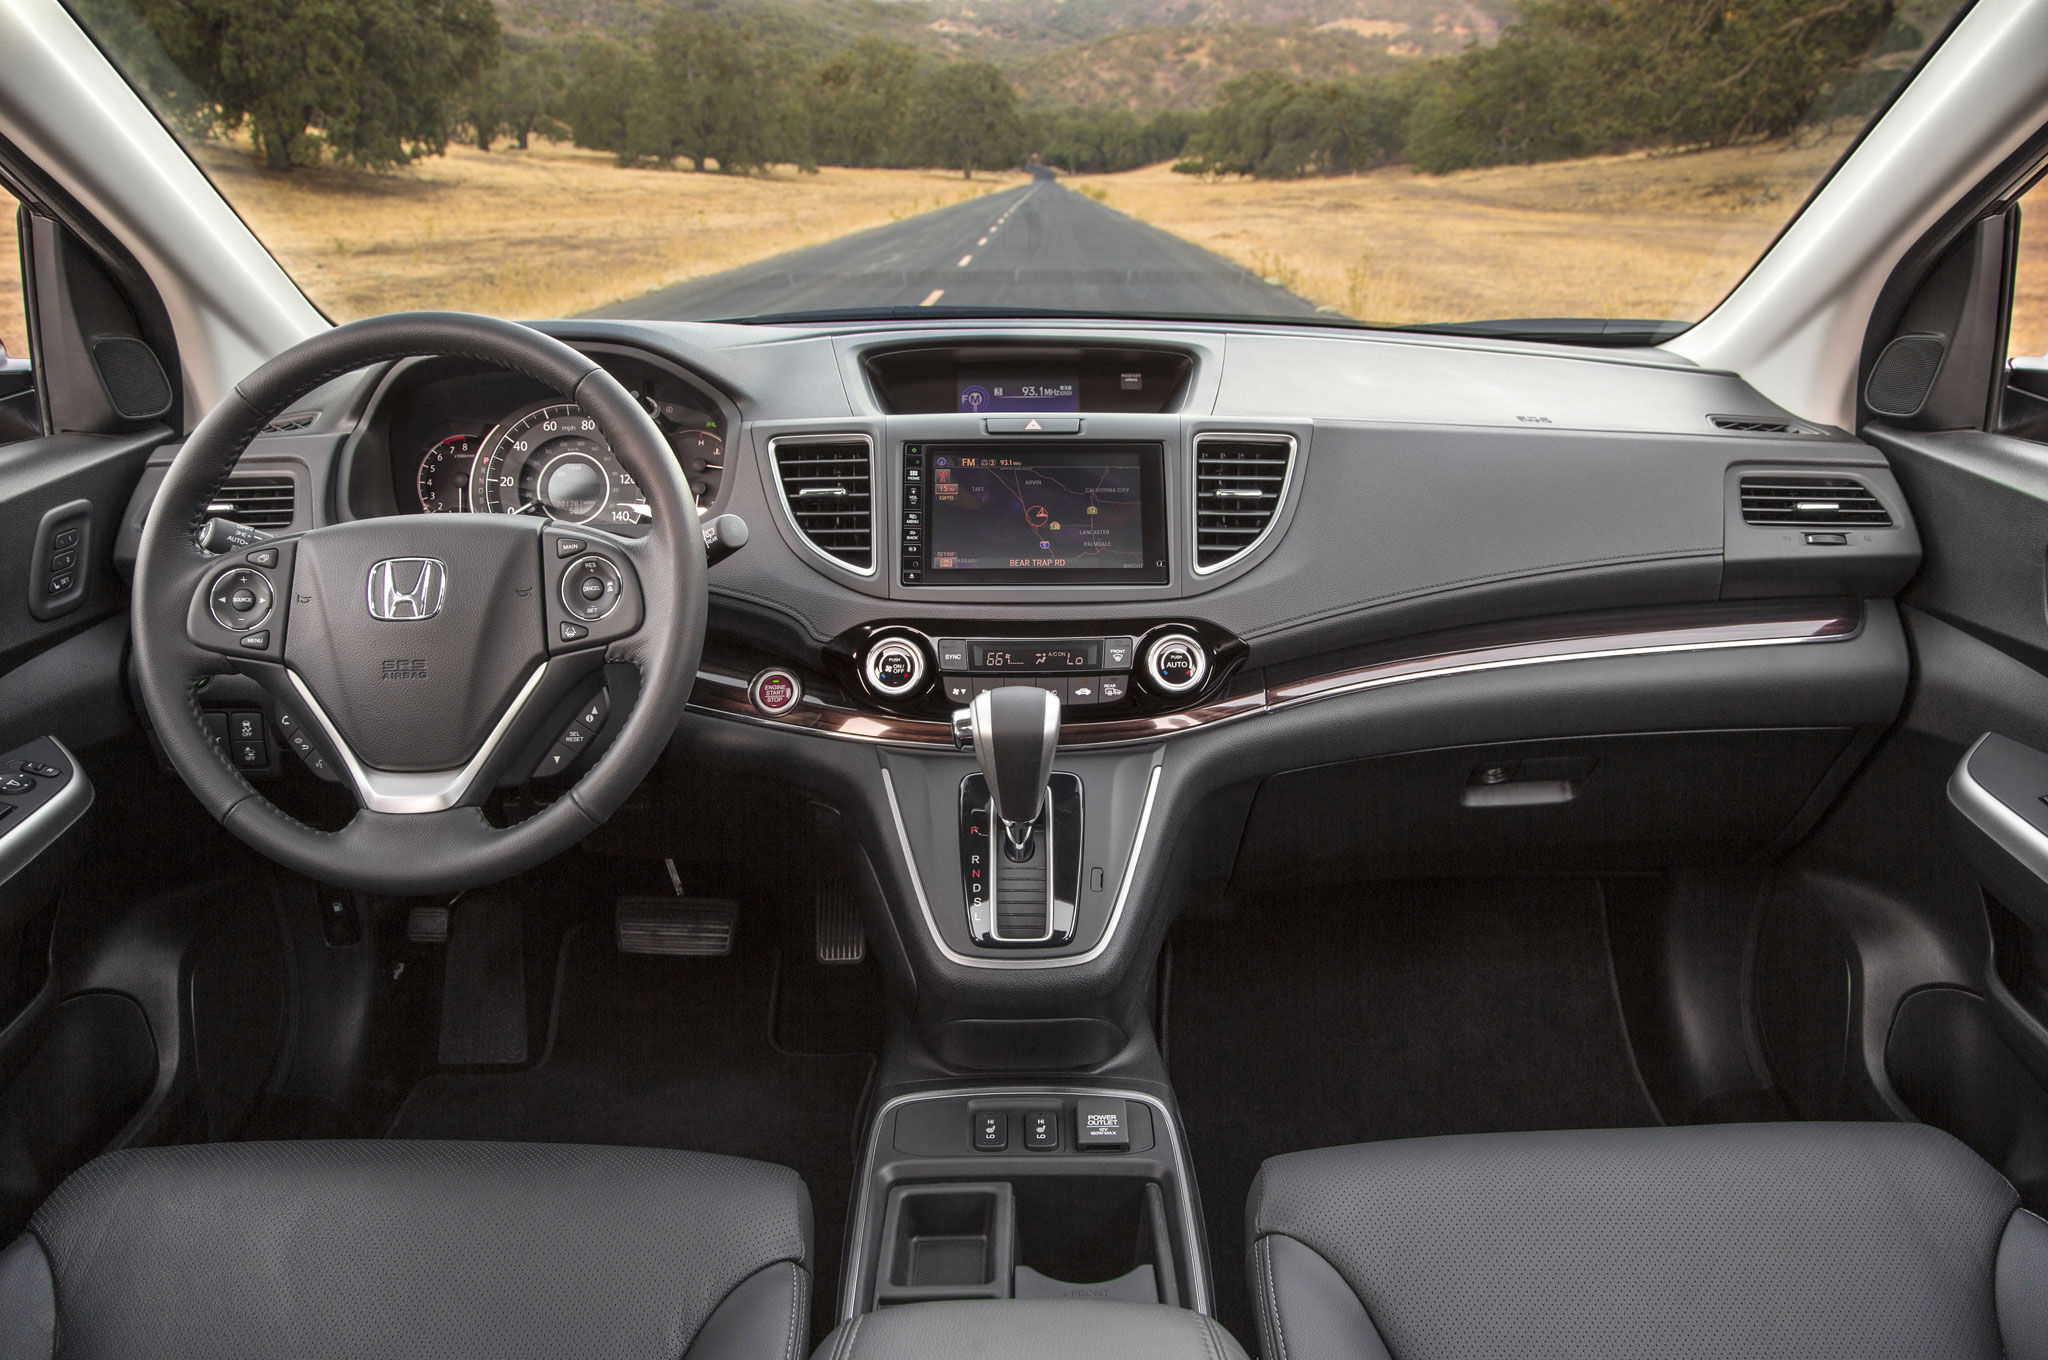 crv cr reviews interior carwow old new honda vs v blog compared